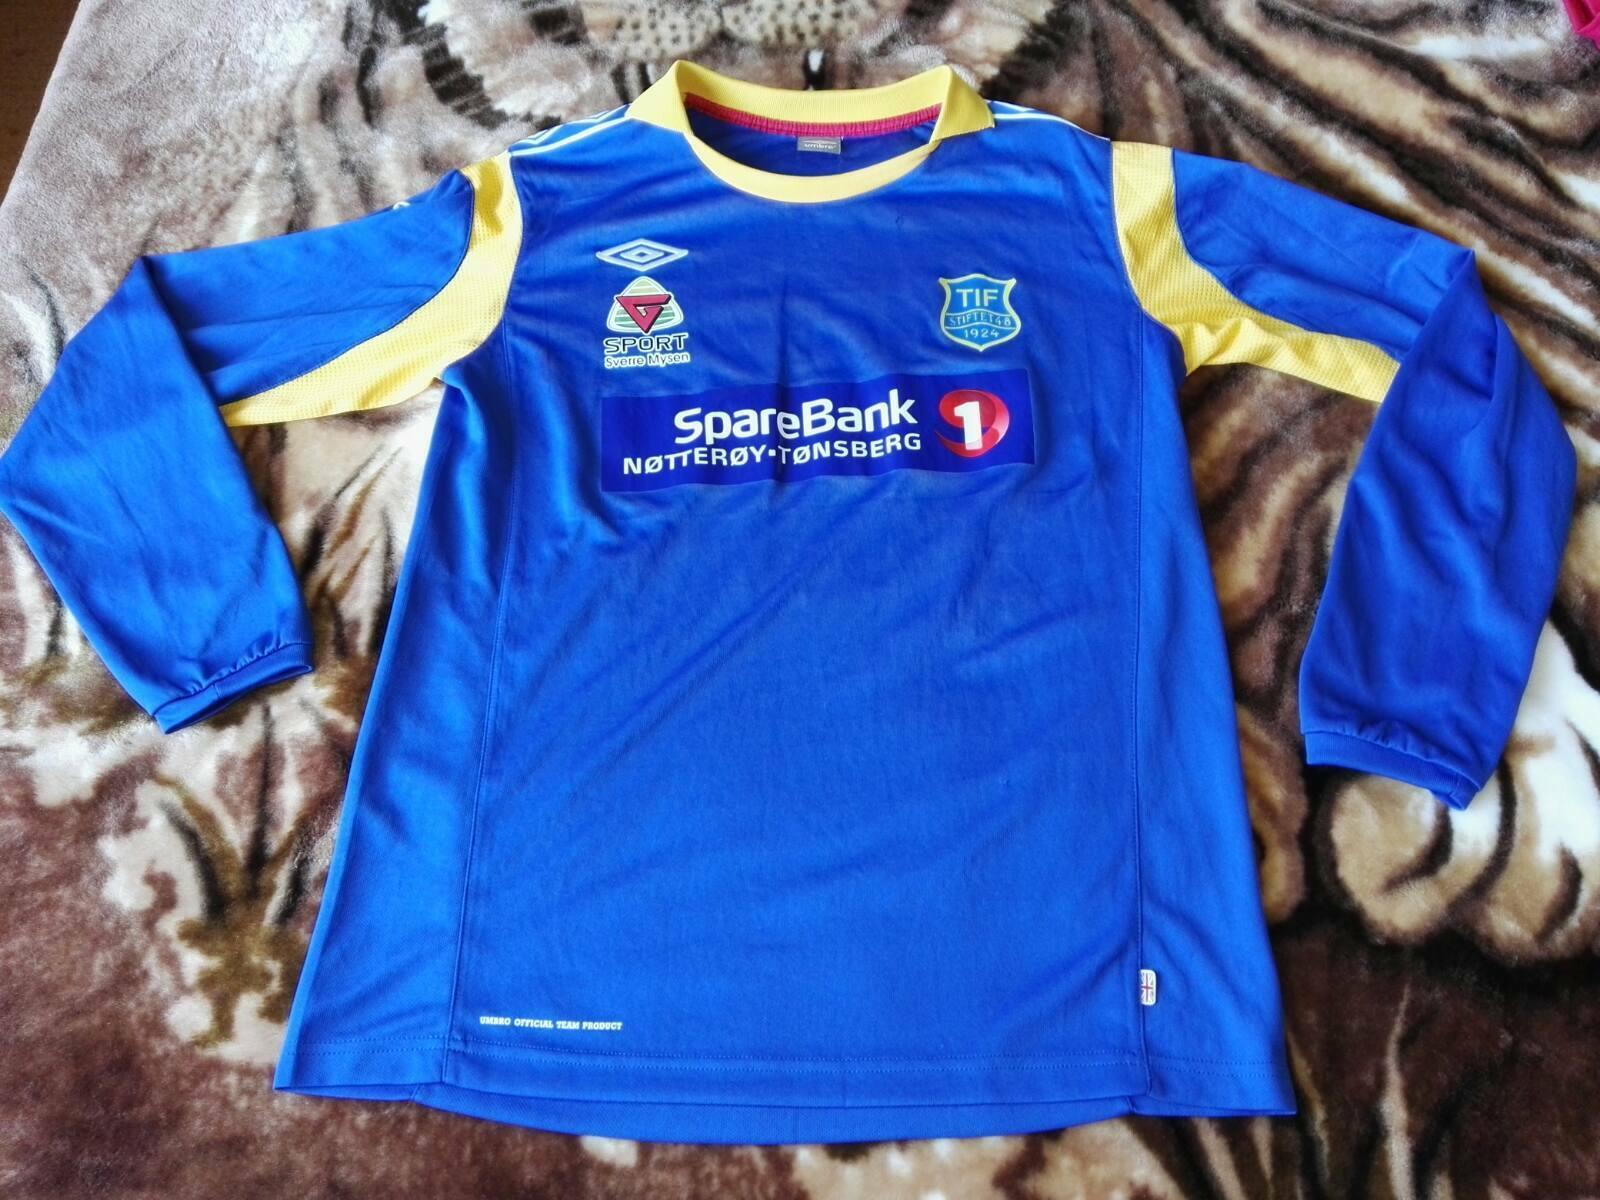 RARE tifstiftet 1924 1924 1924 Norvegia Calcio Shirt vinrage UMBRO   8 Taglia L stile retrò distintivo 034